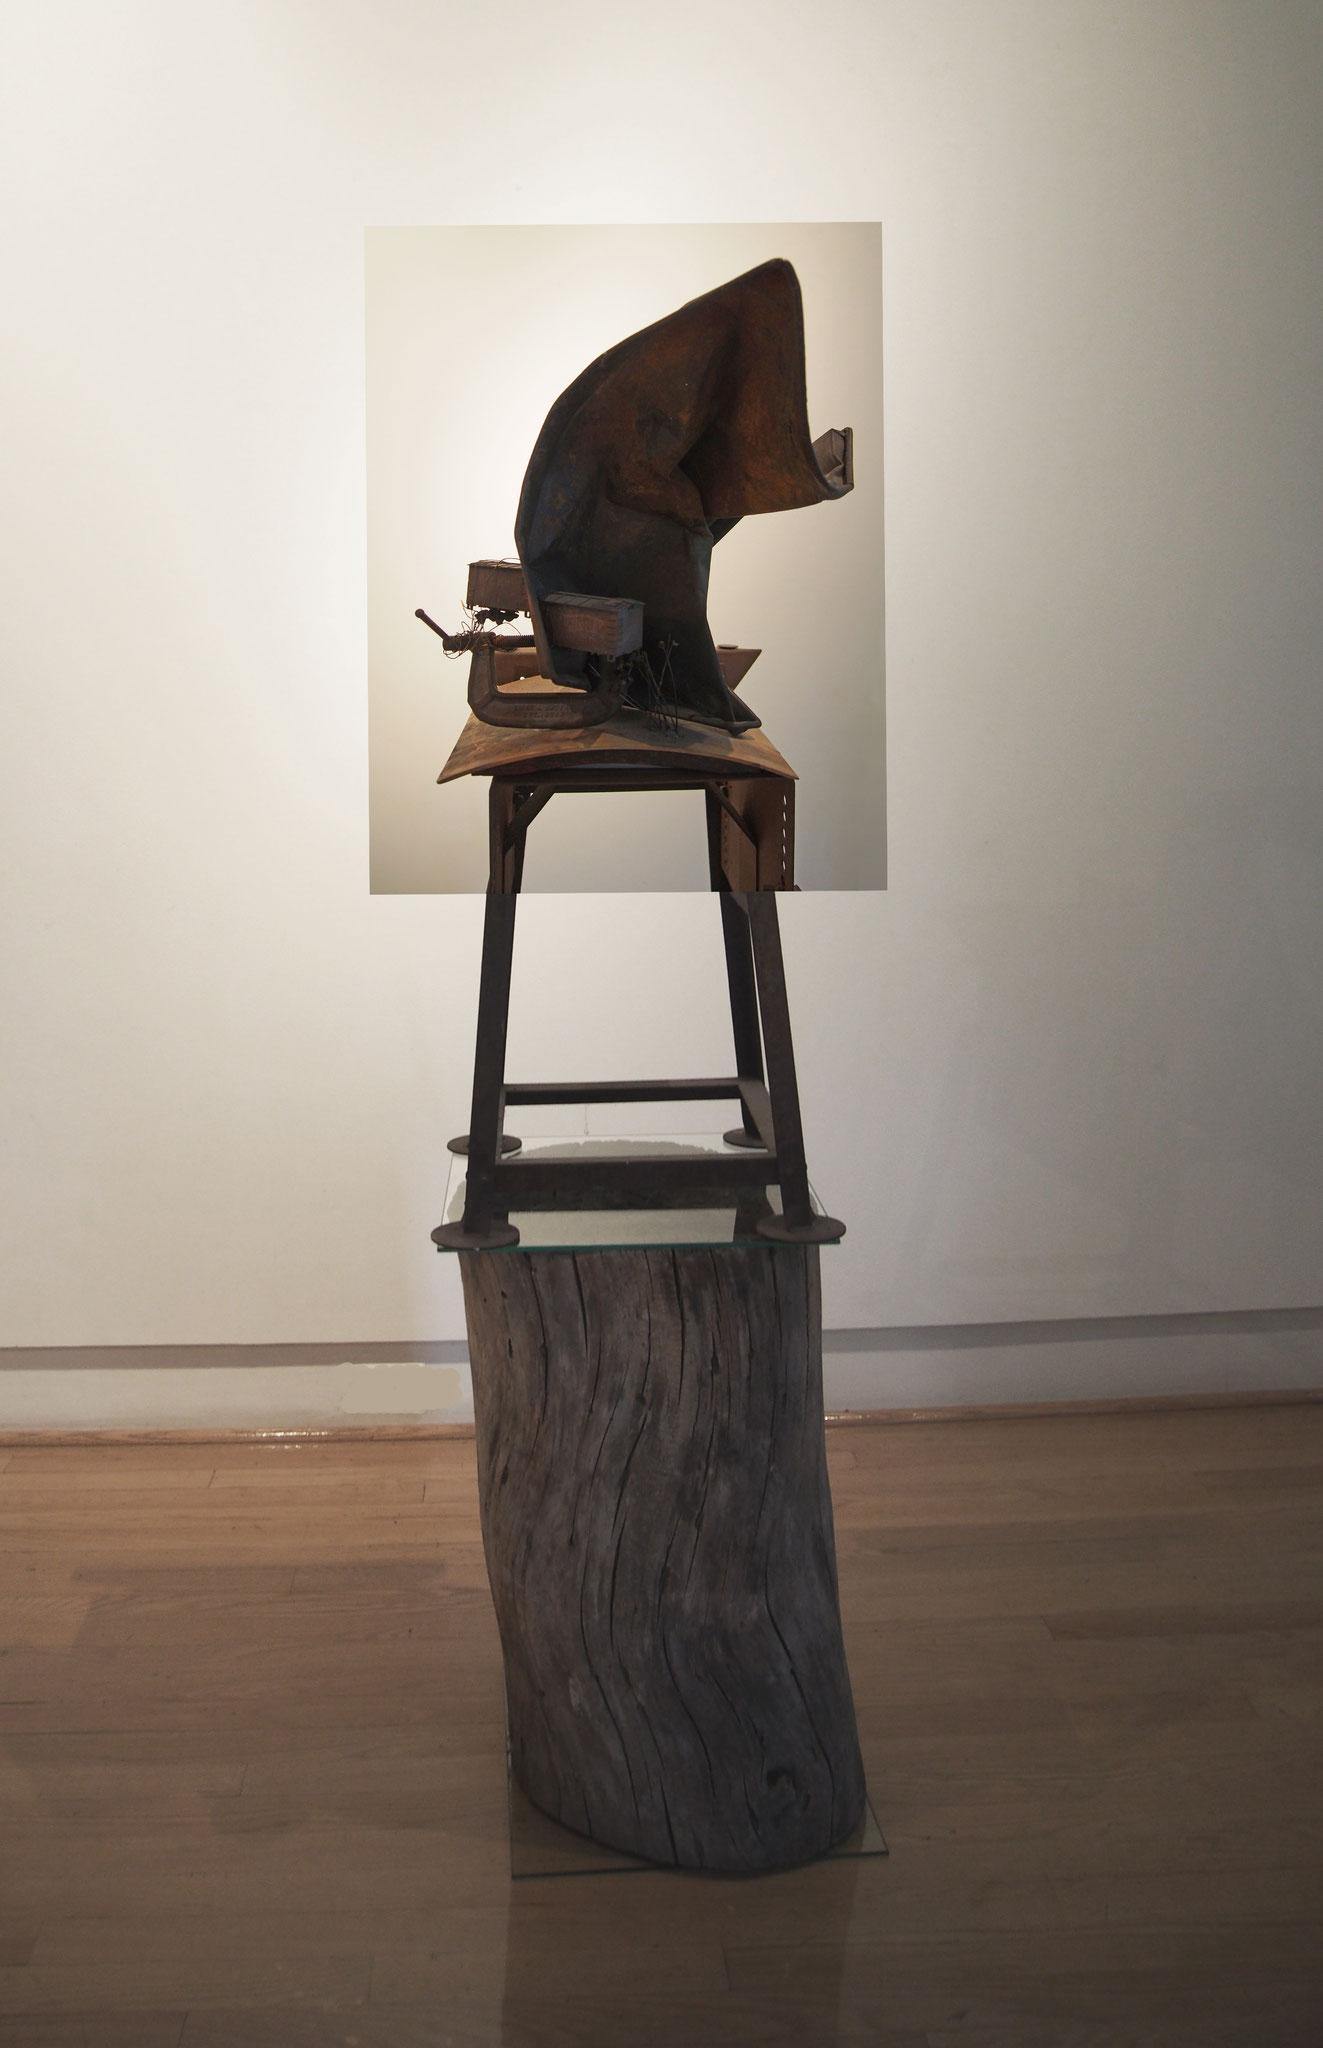 Sculpture by Jeremy Gordaneer upon found tree stump